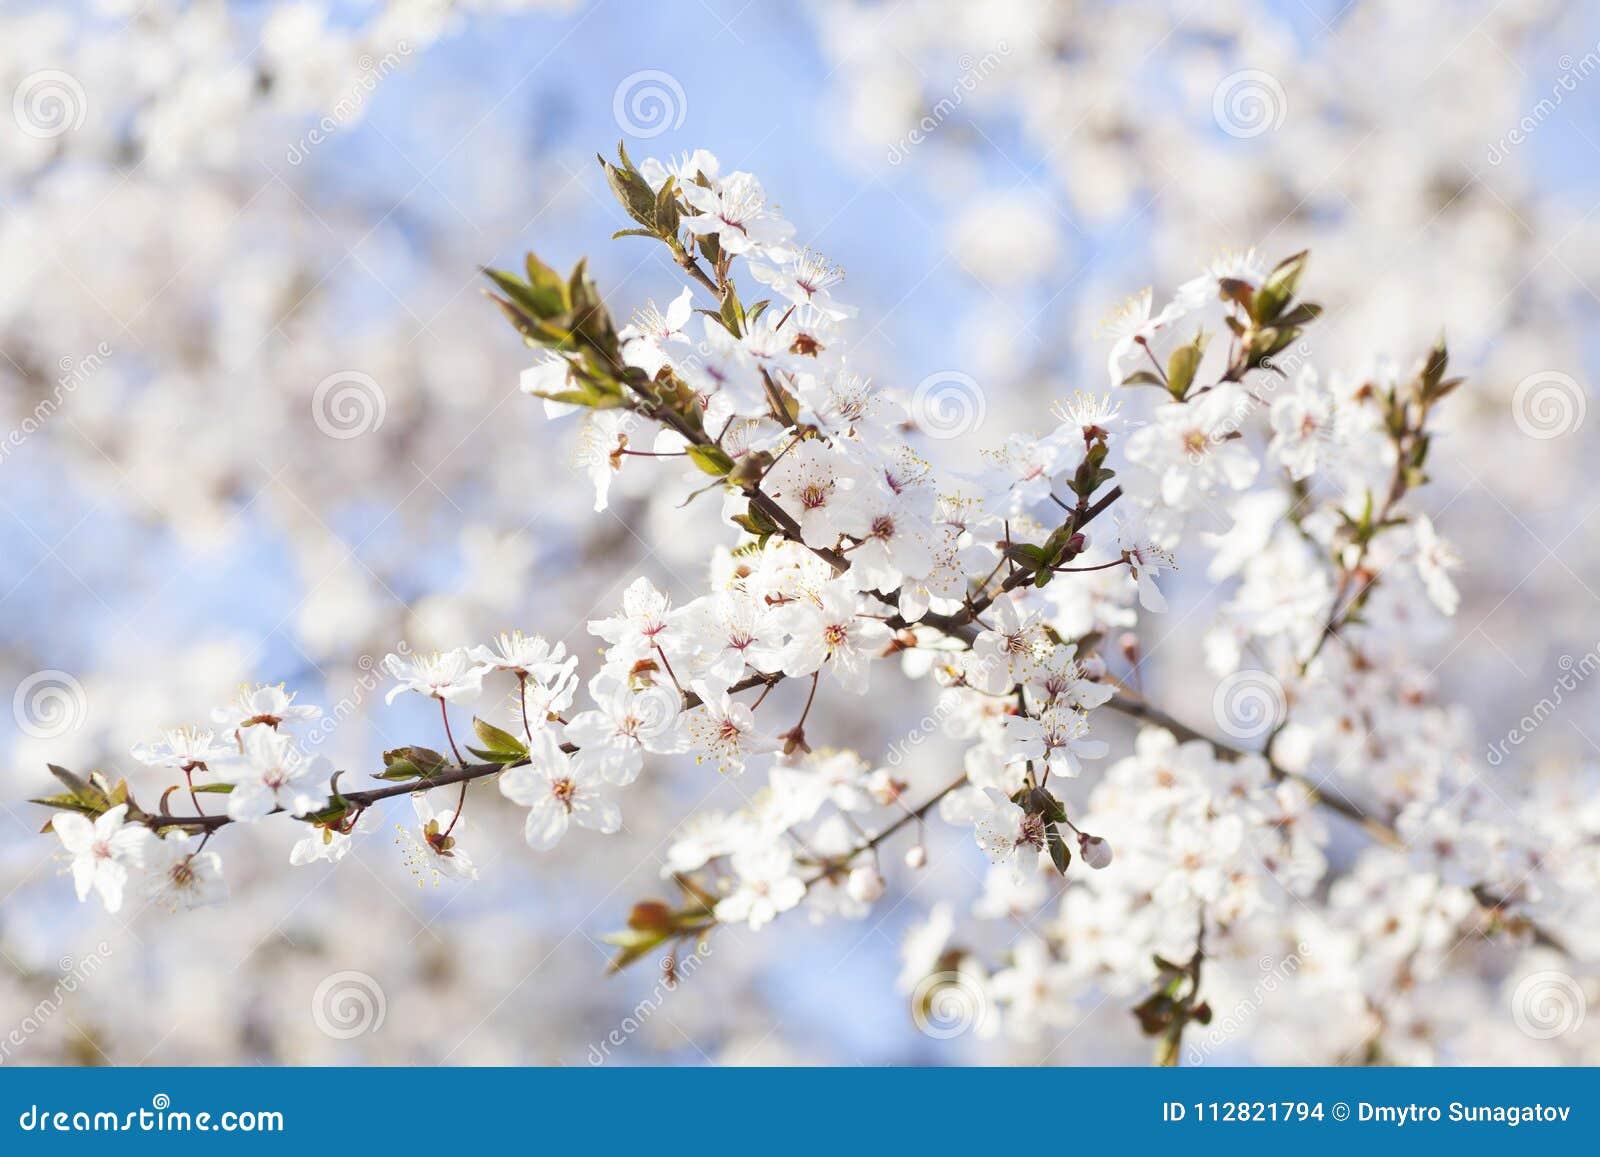 Fiori Bianchi Di Primavera.Bella Donna In Primavera Fiori Bianchi Di Fioritura Degli Alberi